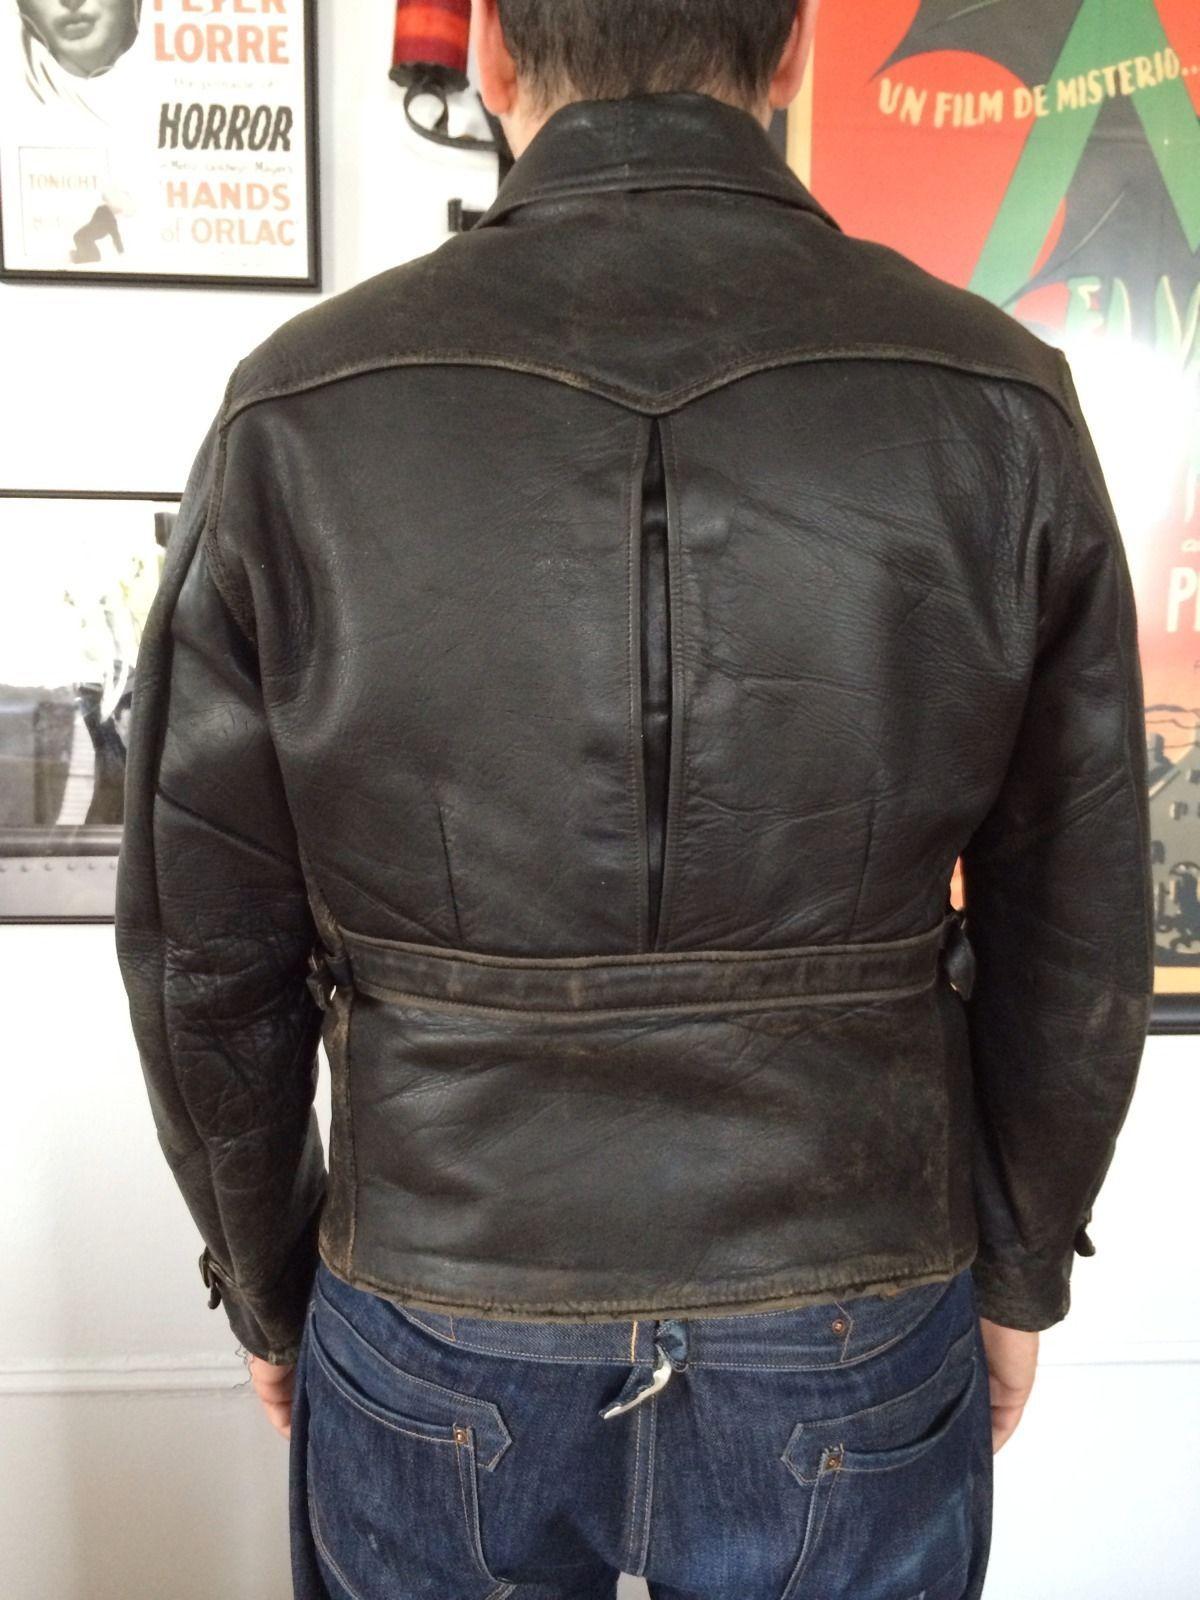 Vintage 1920s 1930s Black Leather Jacket Functioning Center Pleat Action Back Ebay Black Leather Jacket Leather Jacket Jackets [ 1600 x 1200 Pixel ]